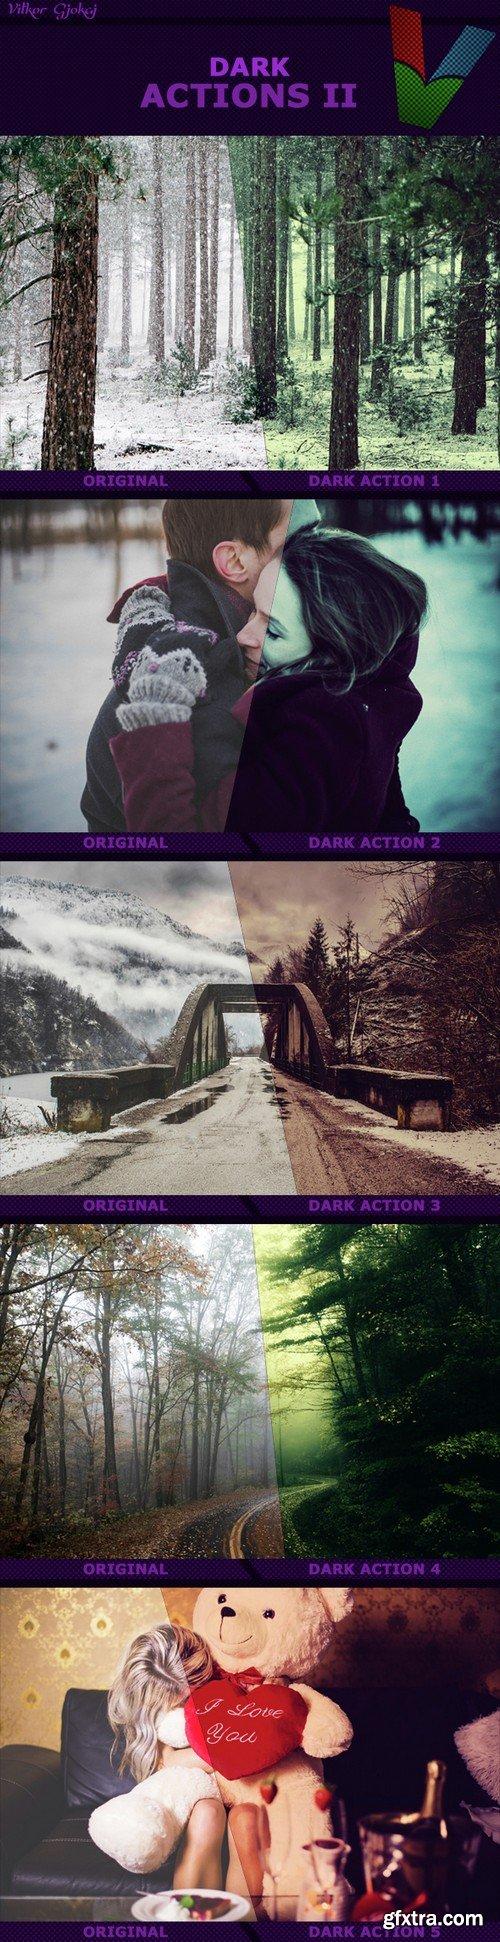 Graphicriver - Dark Actions II 14941405